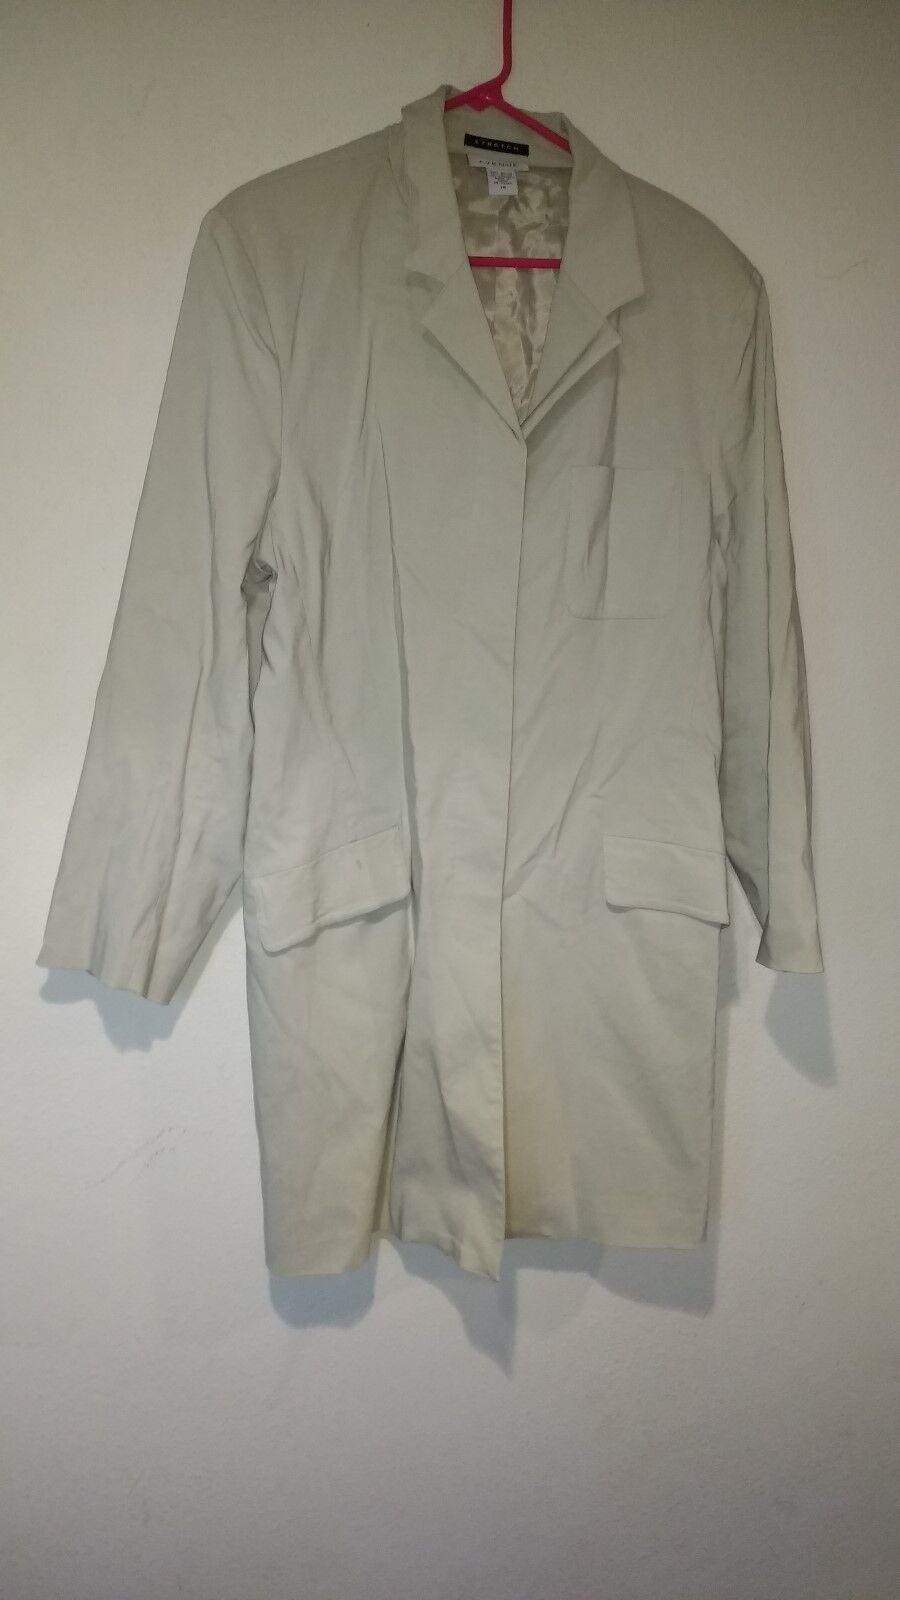 Woman's Stretch Peacoat Jacket Hidden Button Below Waist Length Overcoat Khaki